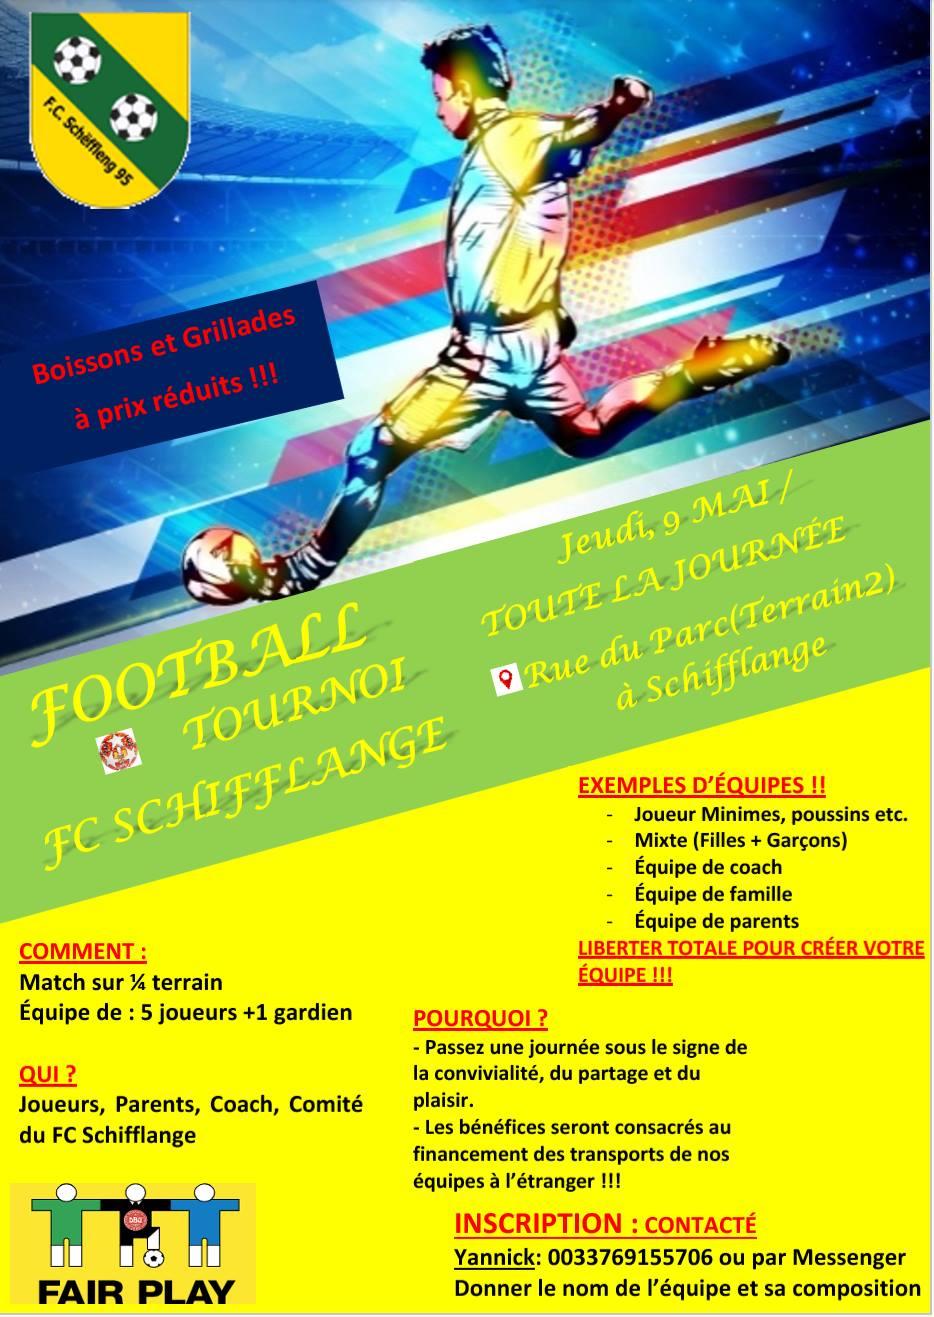 fête familiale FC Schëffleng 9 mai 2019